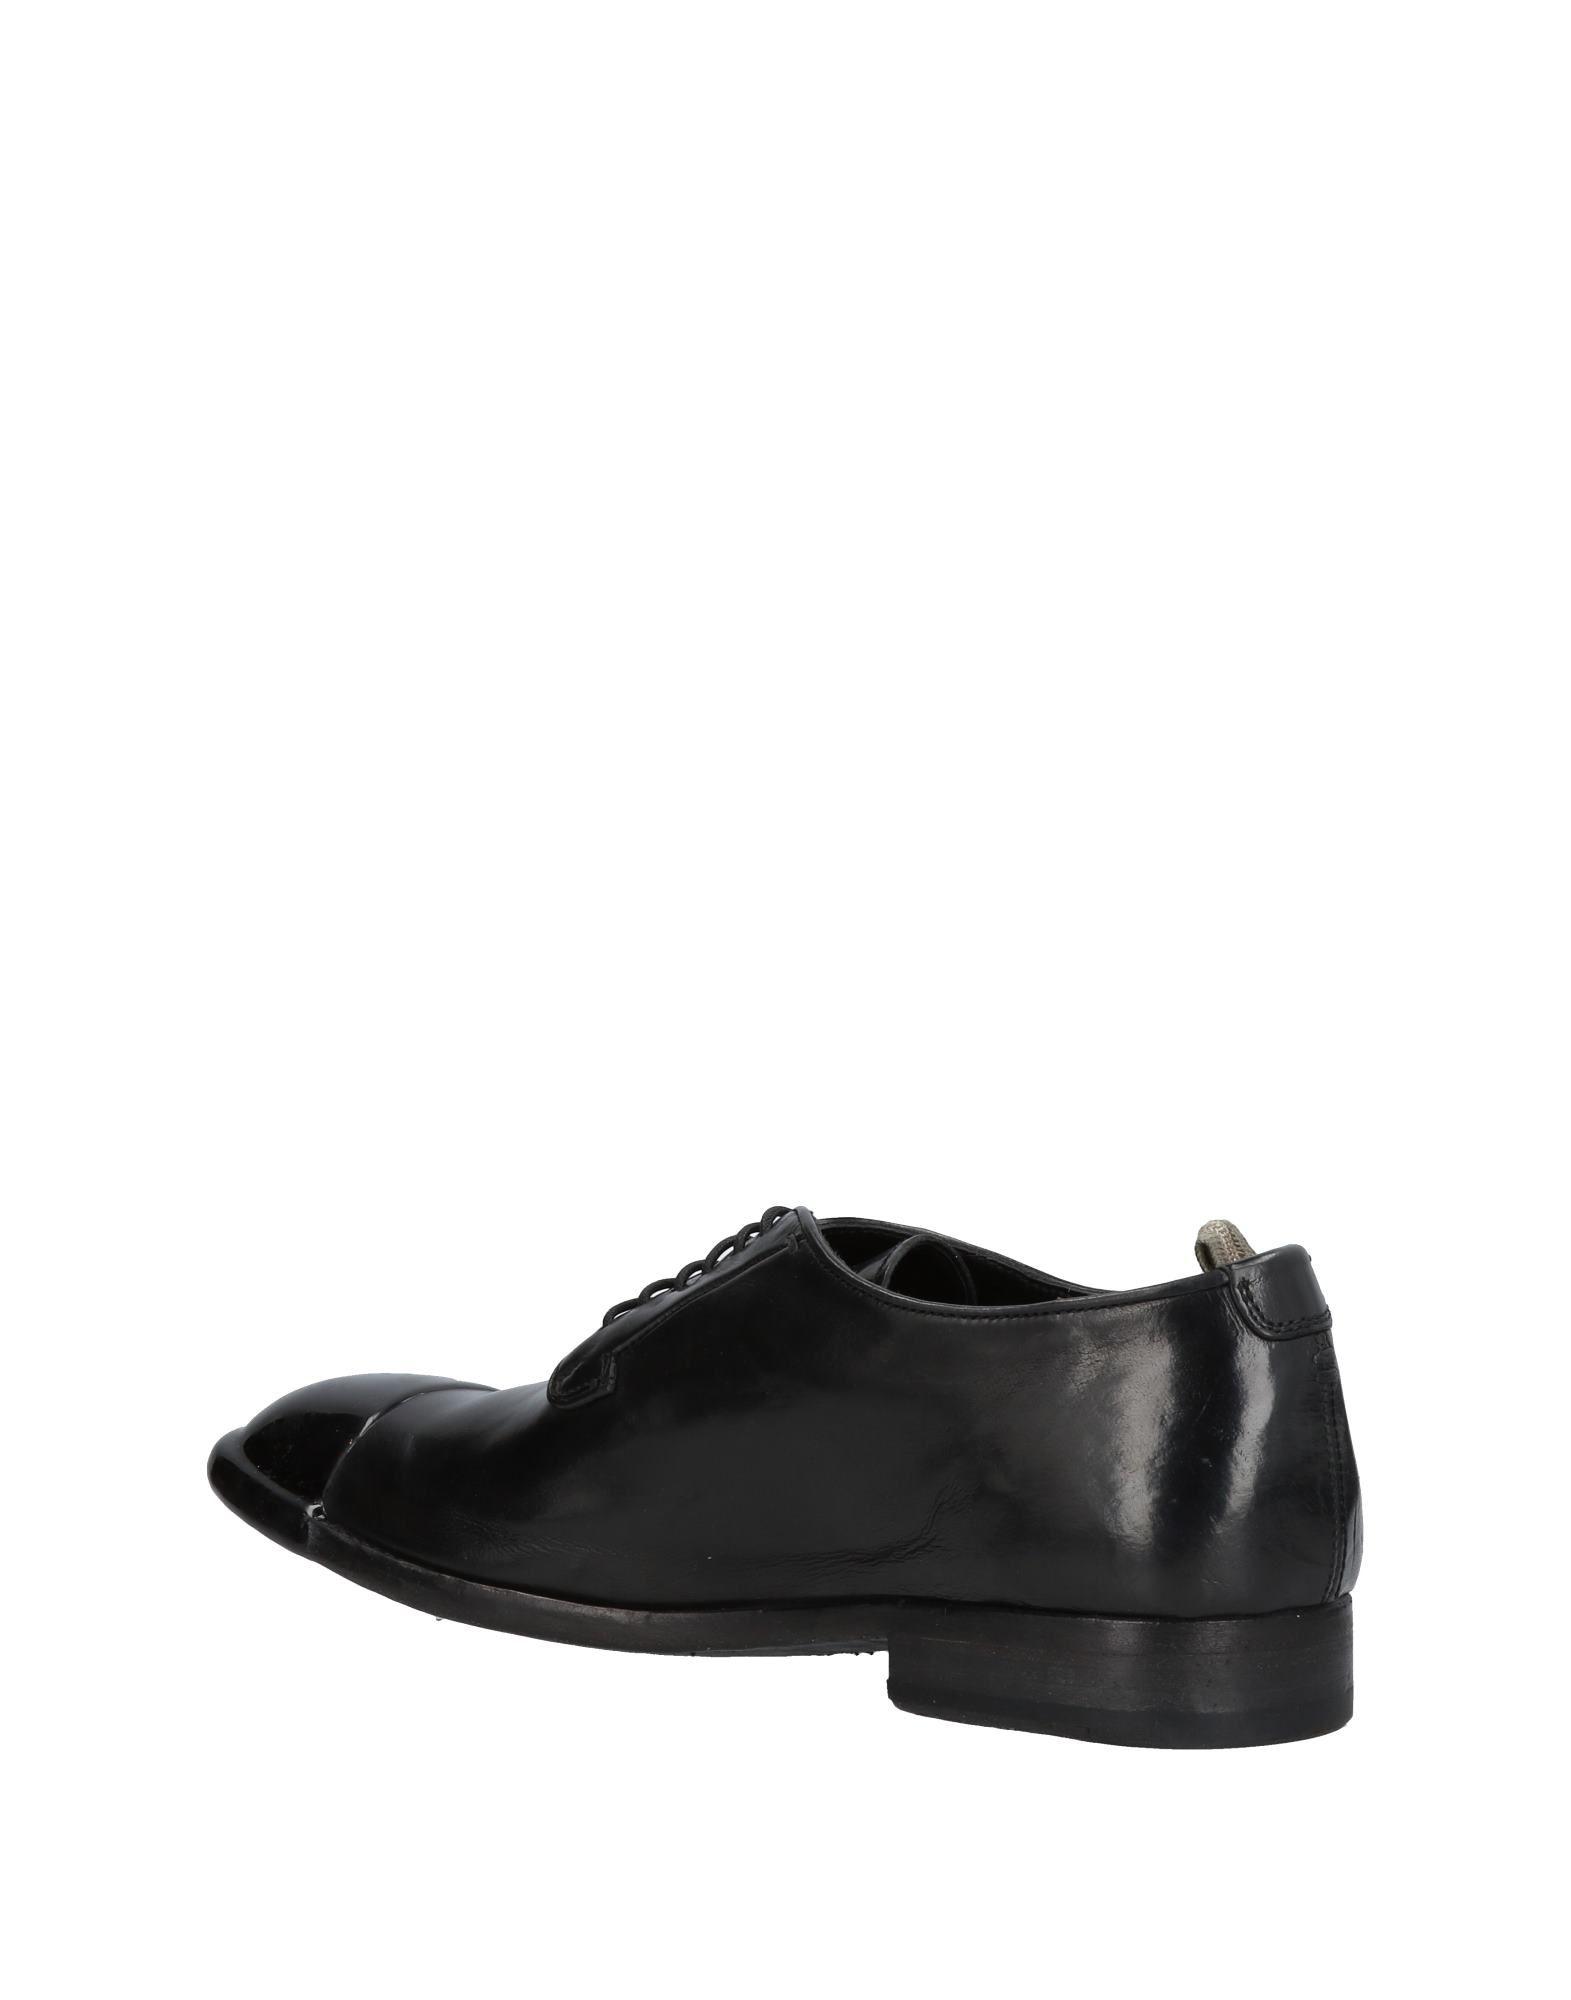 Chaussures - Chaussures À Lacets Officine Italia Créatifs EQ0N4th9